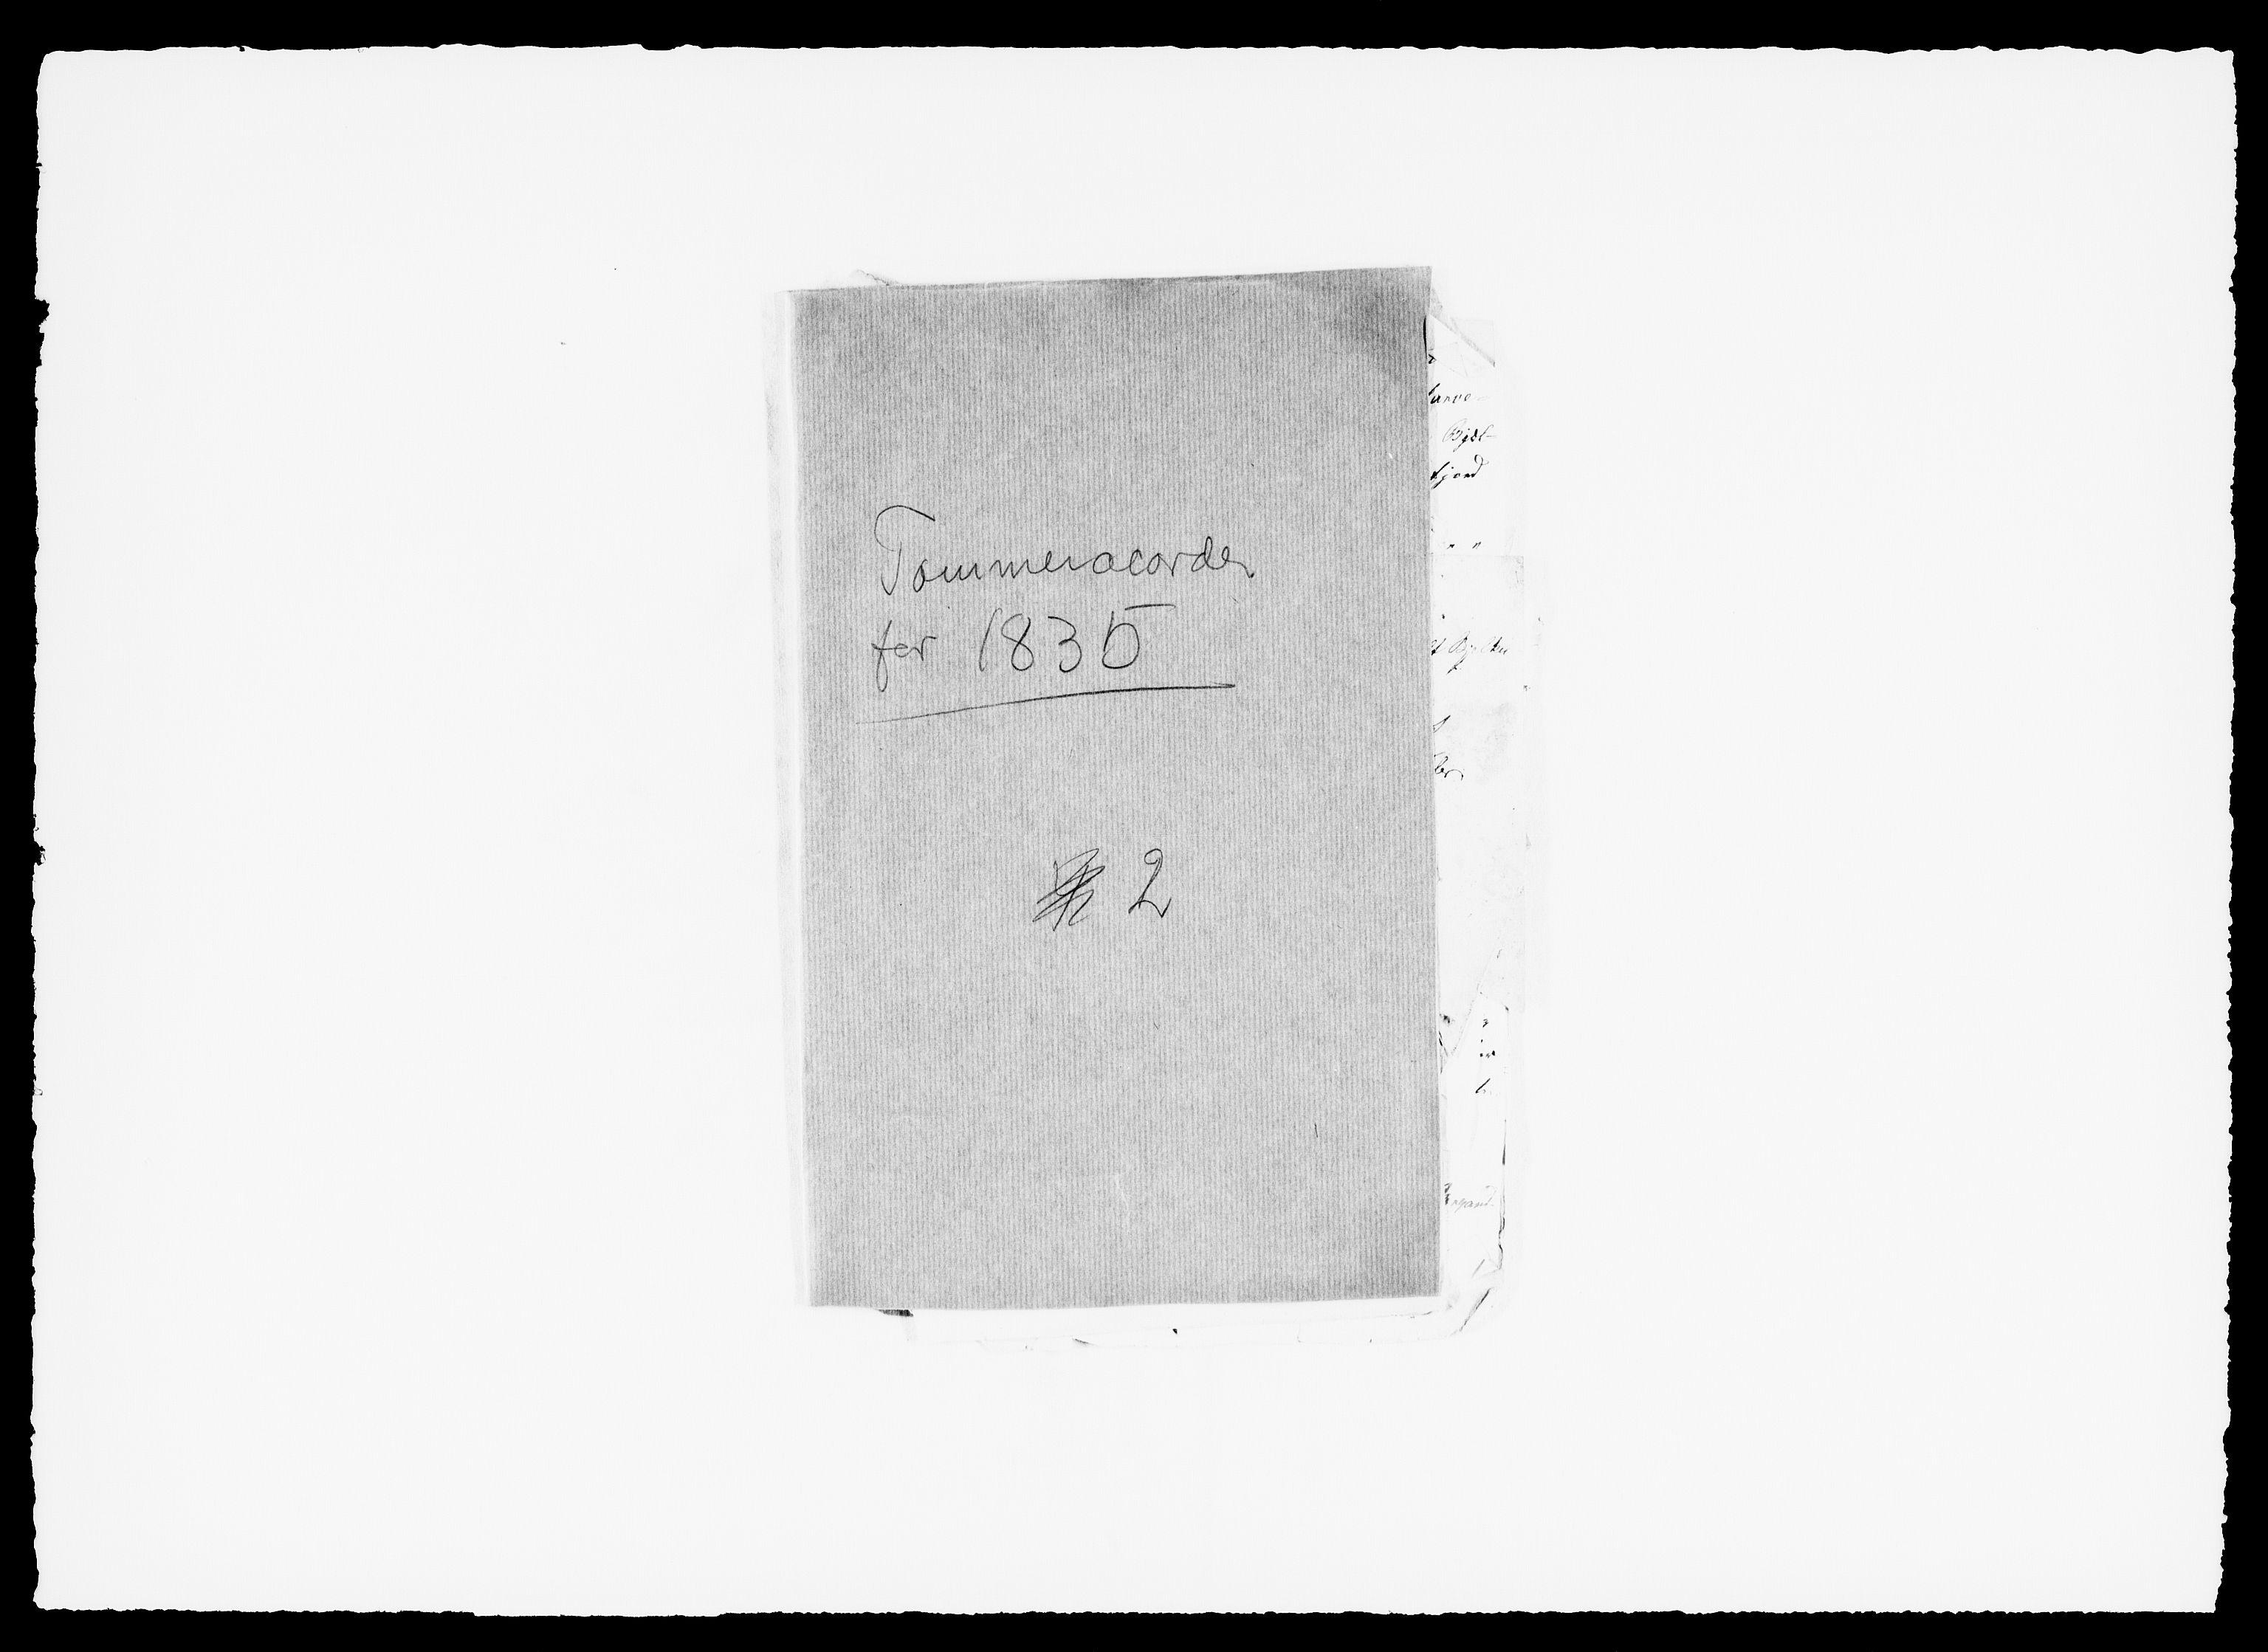 RA, Modums Blaafarveværk, G/Ga/L0063, 1827-1849, s. 245